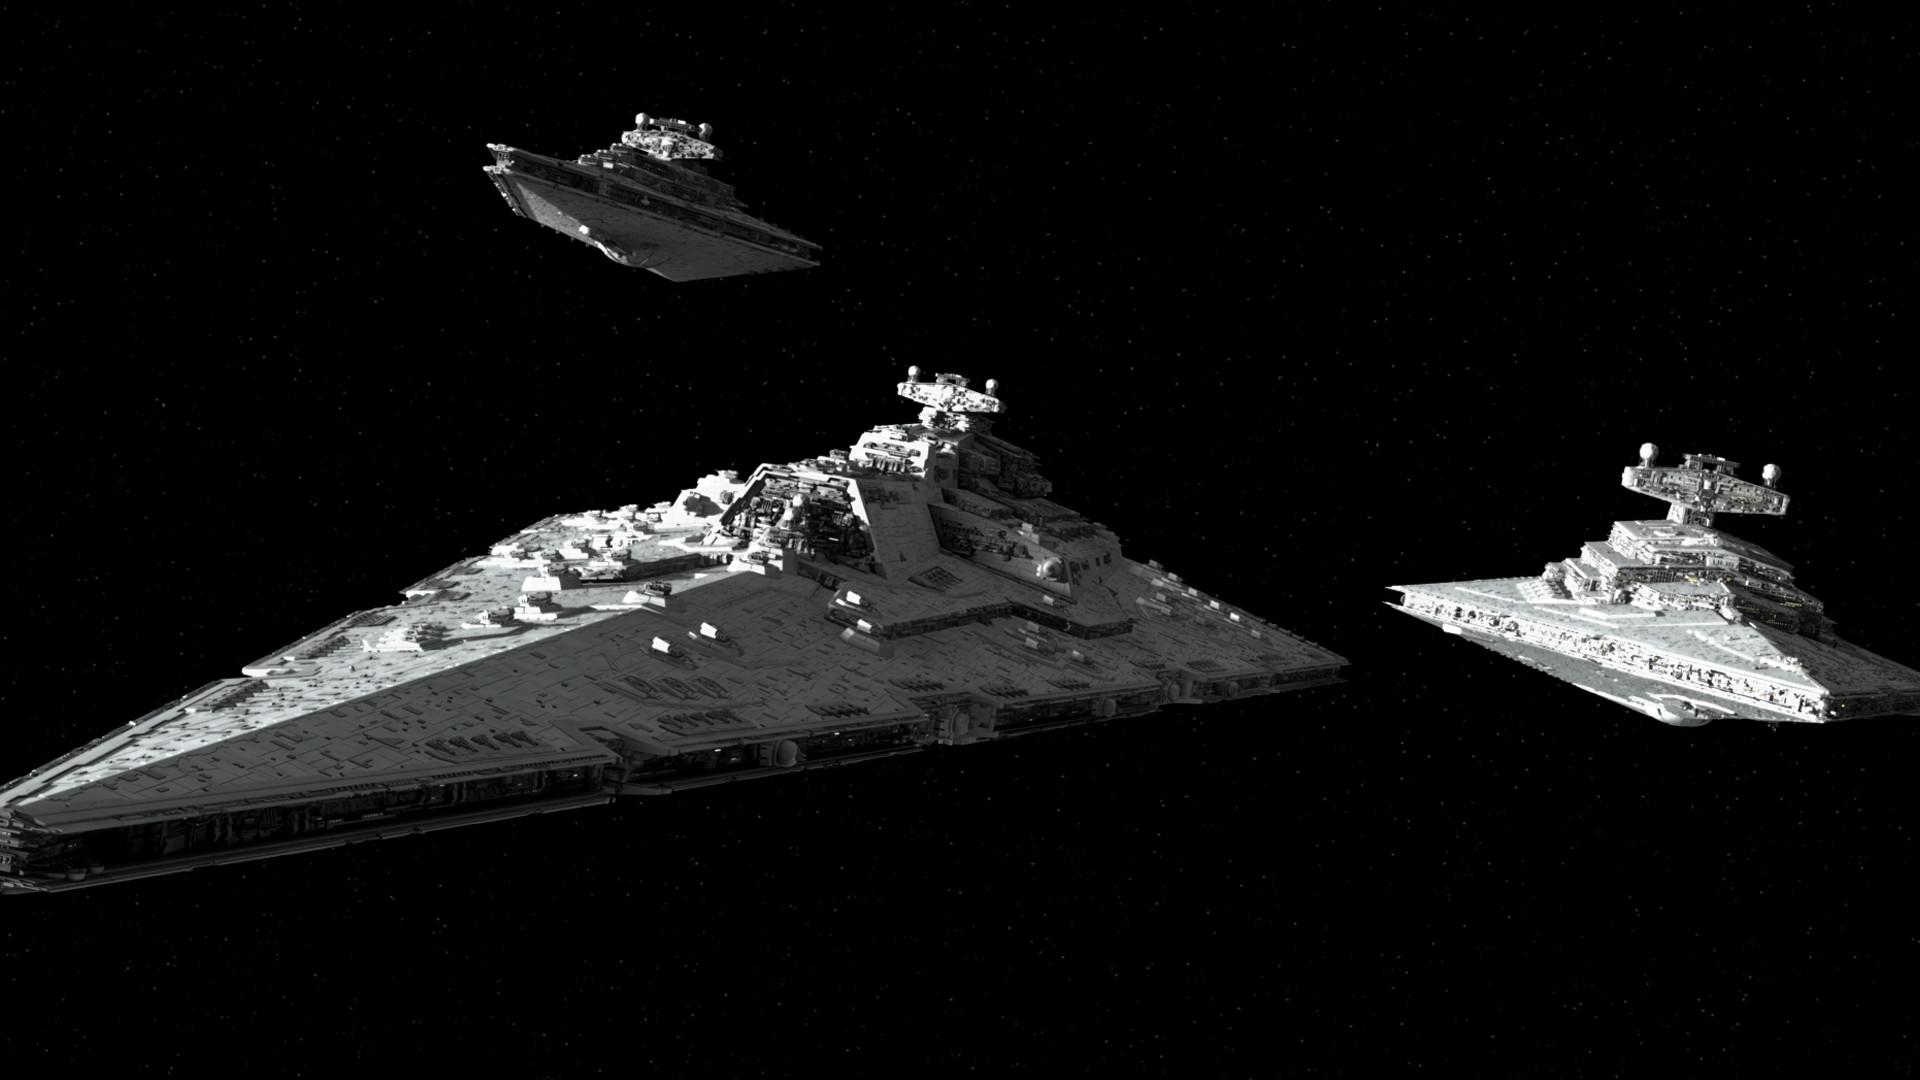 Imperial Star Destroyer Wallpaper Lovin dem imperial star